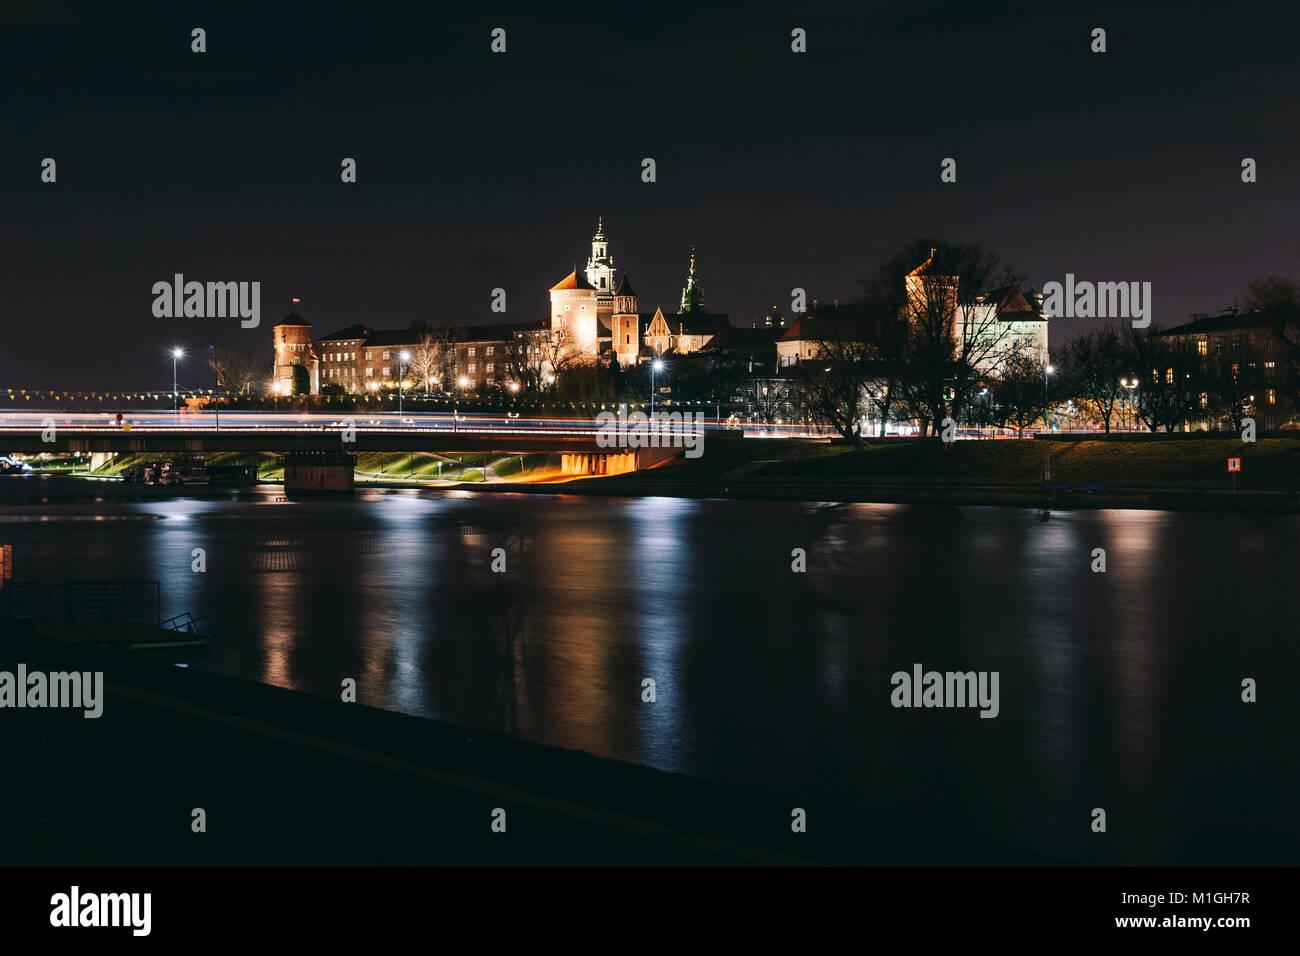 Wawel Castle in Krakow, Poland with Grunwaldzki bridge reflected in the river Vistula at night - Stock Image